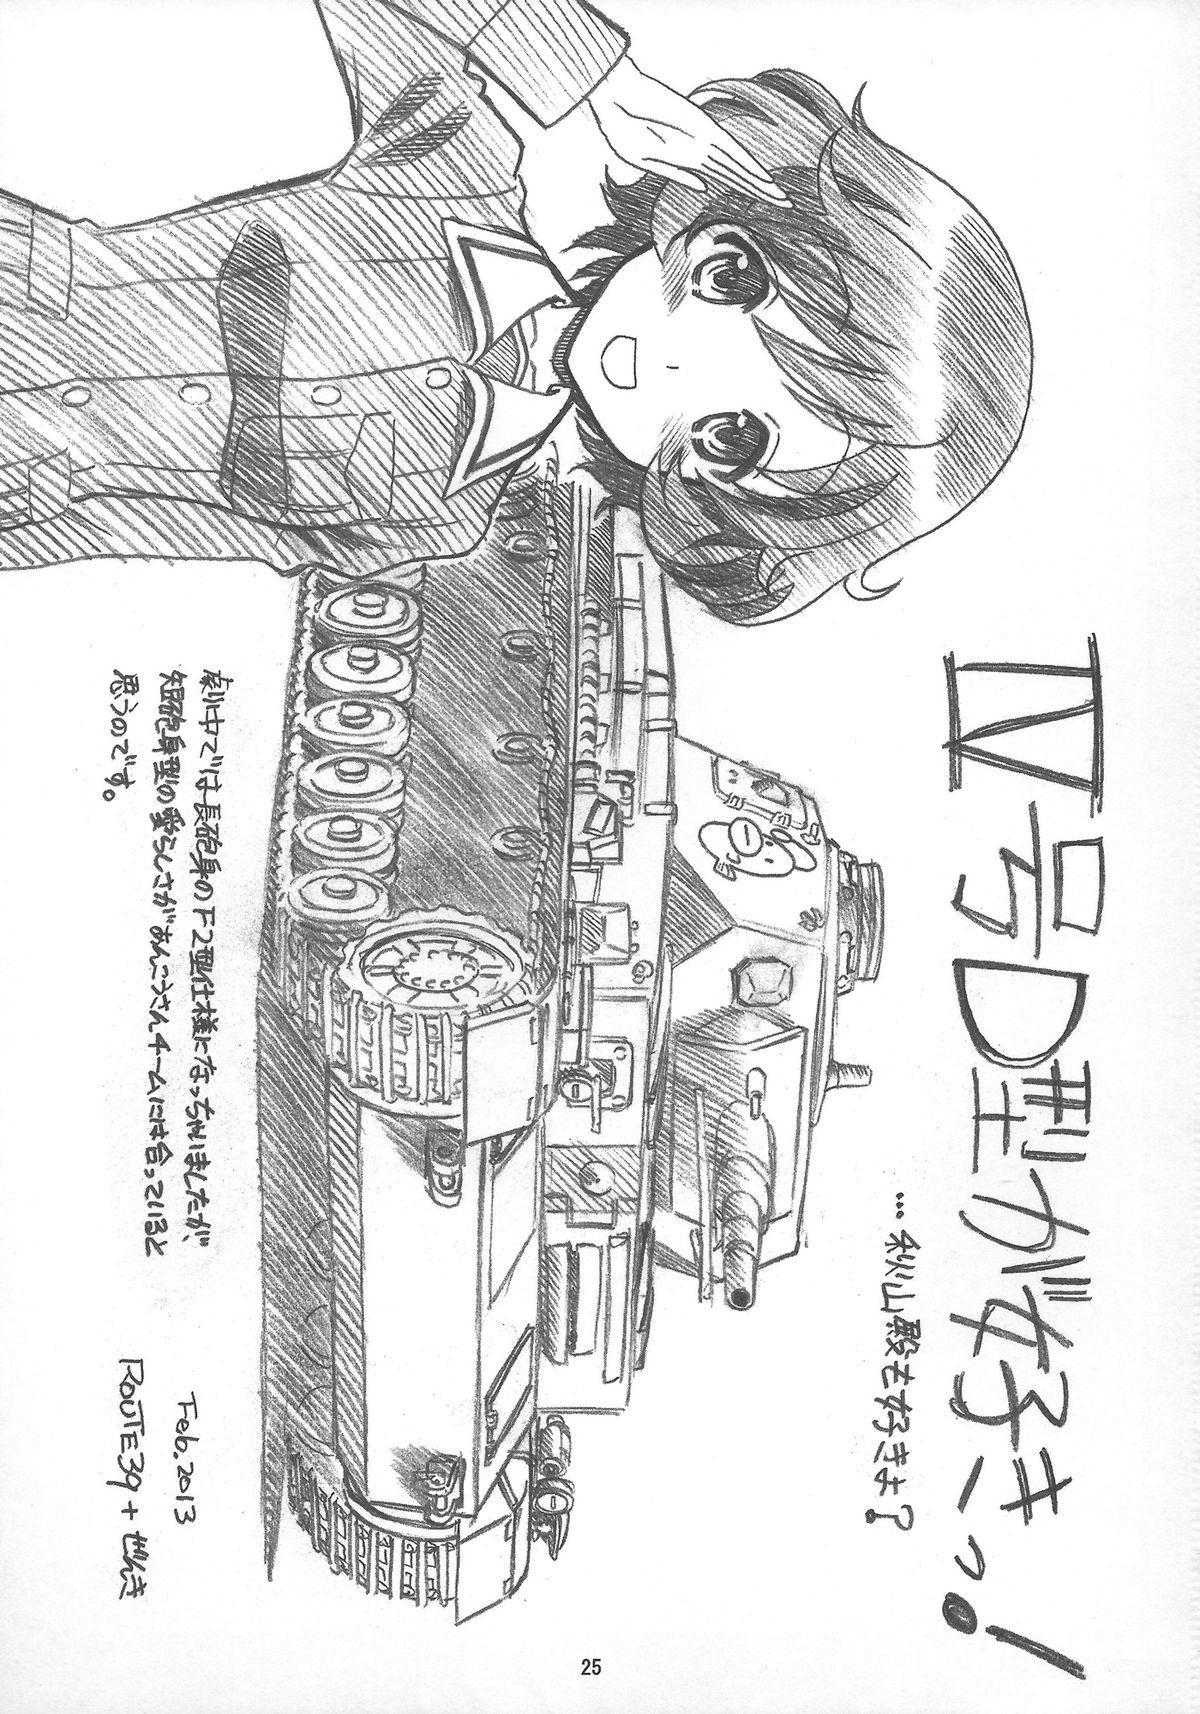 (C84) [bolze.] 「Honanie + Akiyama-dono Sennyudaisakusen (Sippai)」 (Girls und Panzer) 24